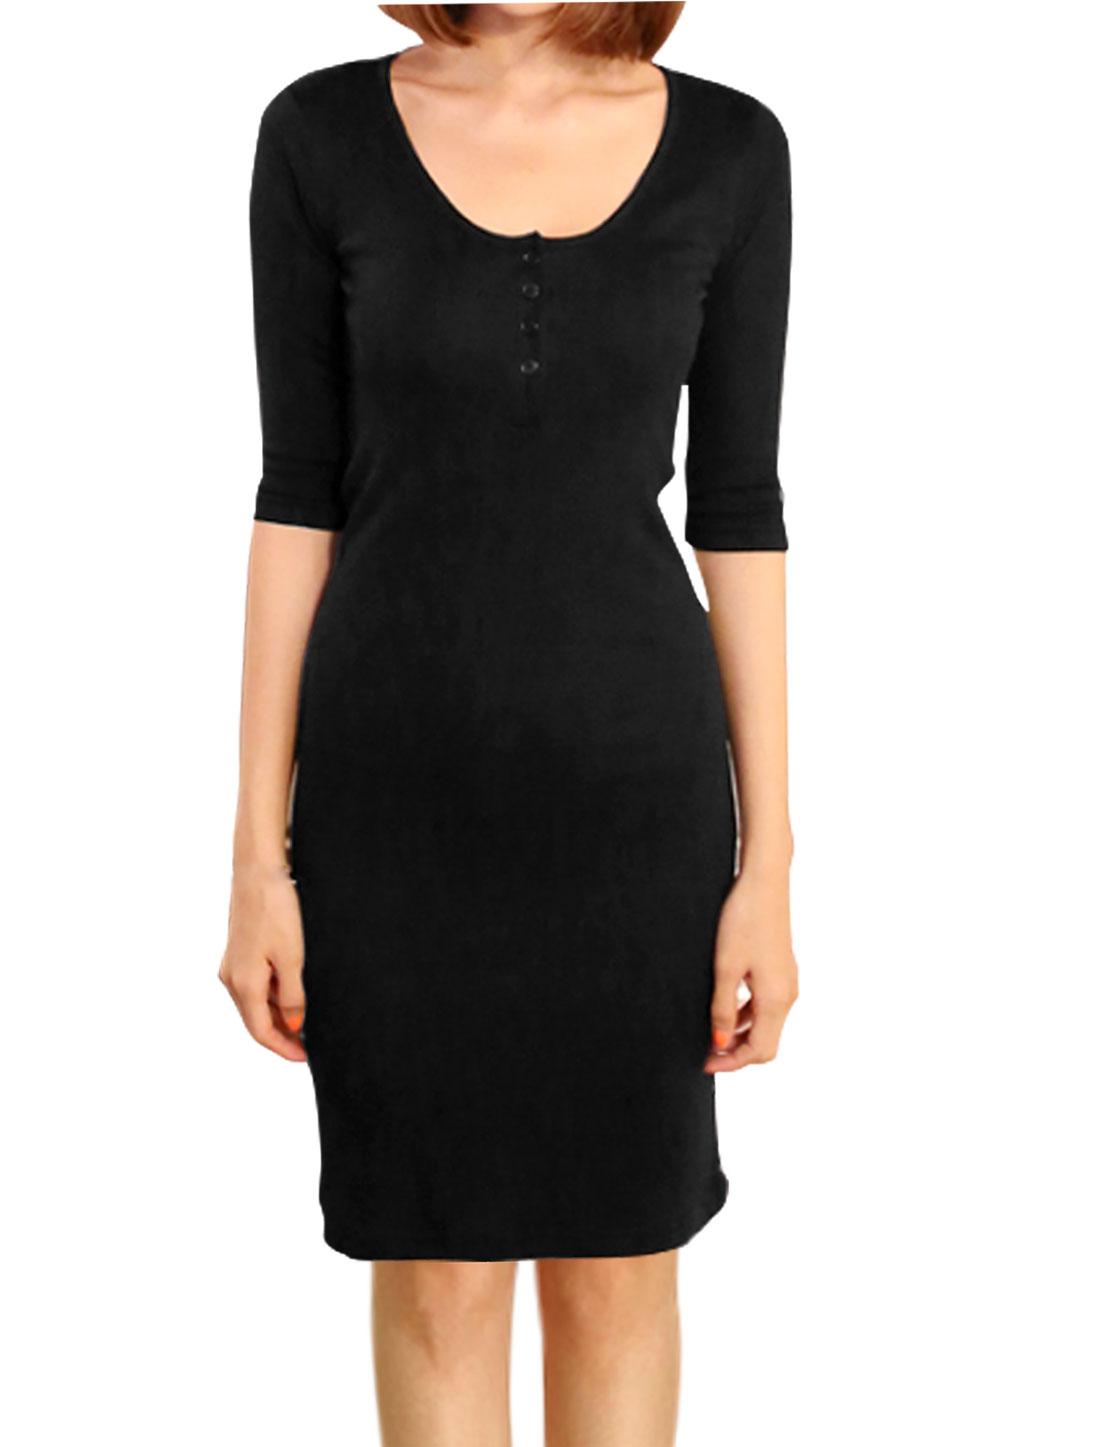 Women Half Button Closure 1/2 Sleeves Sheath Dress Black S